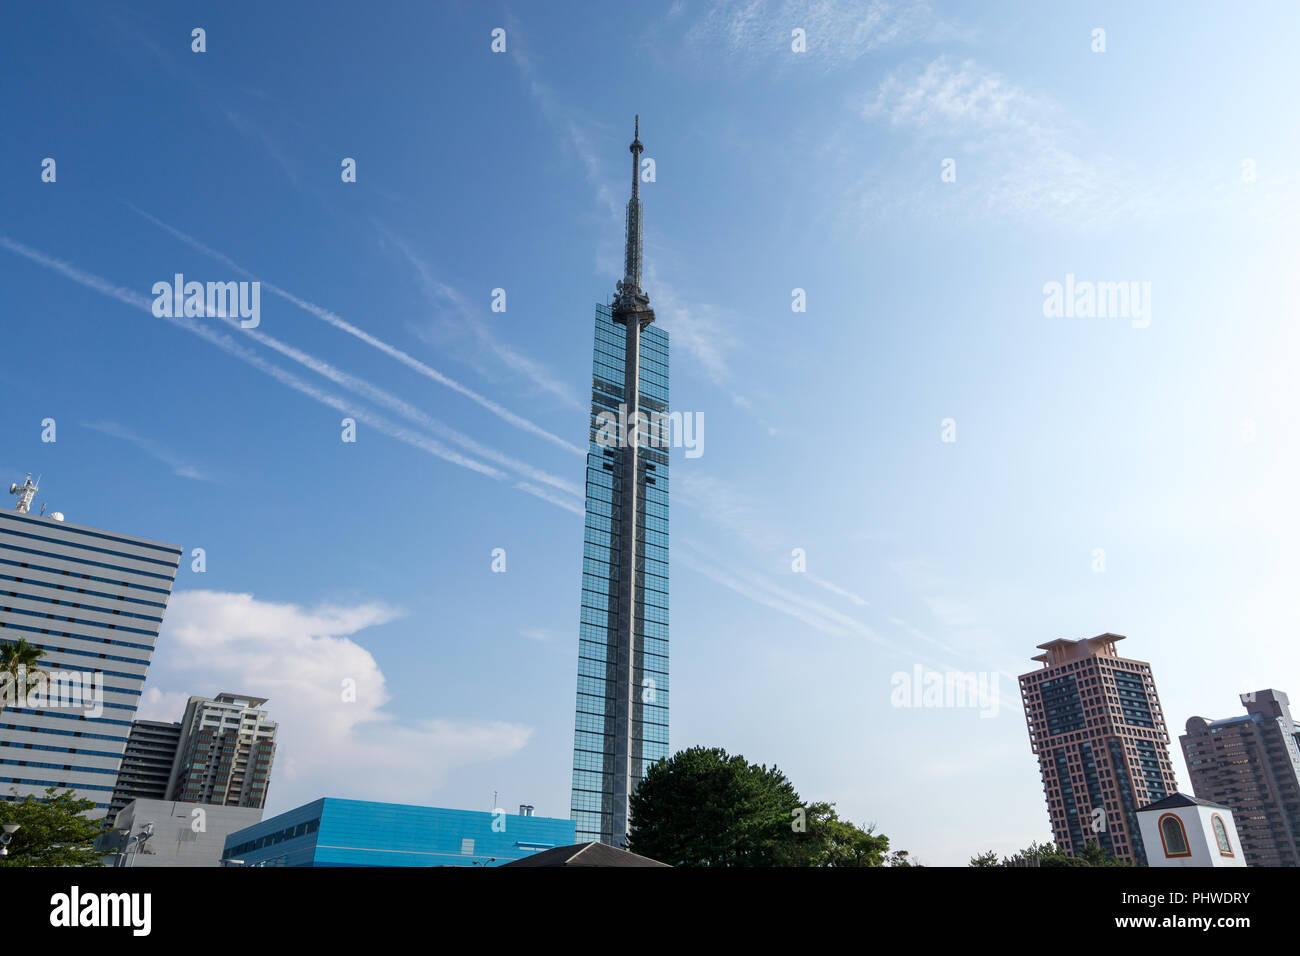 fukuoka tower viewed from below - Stock Image